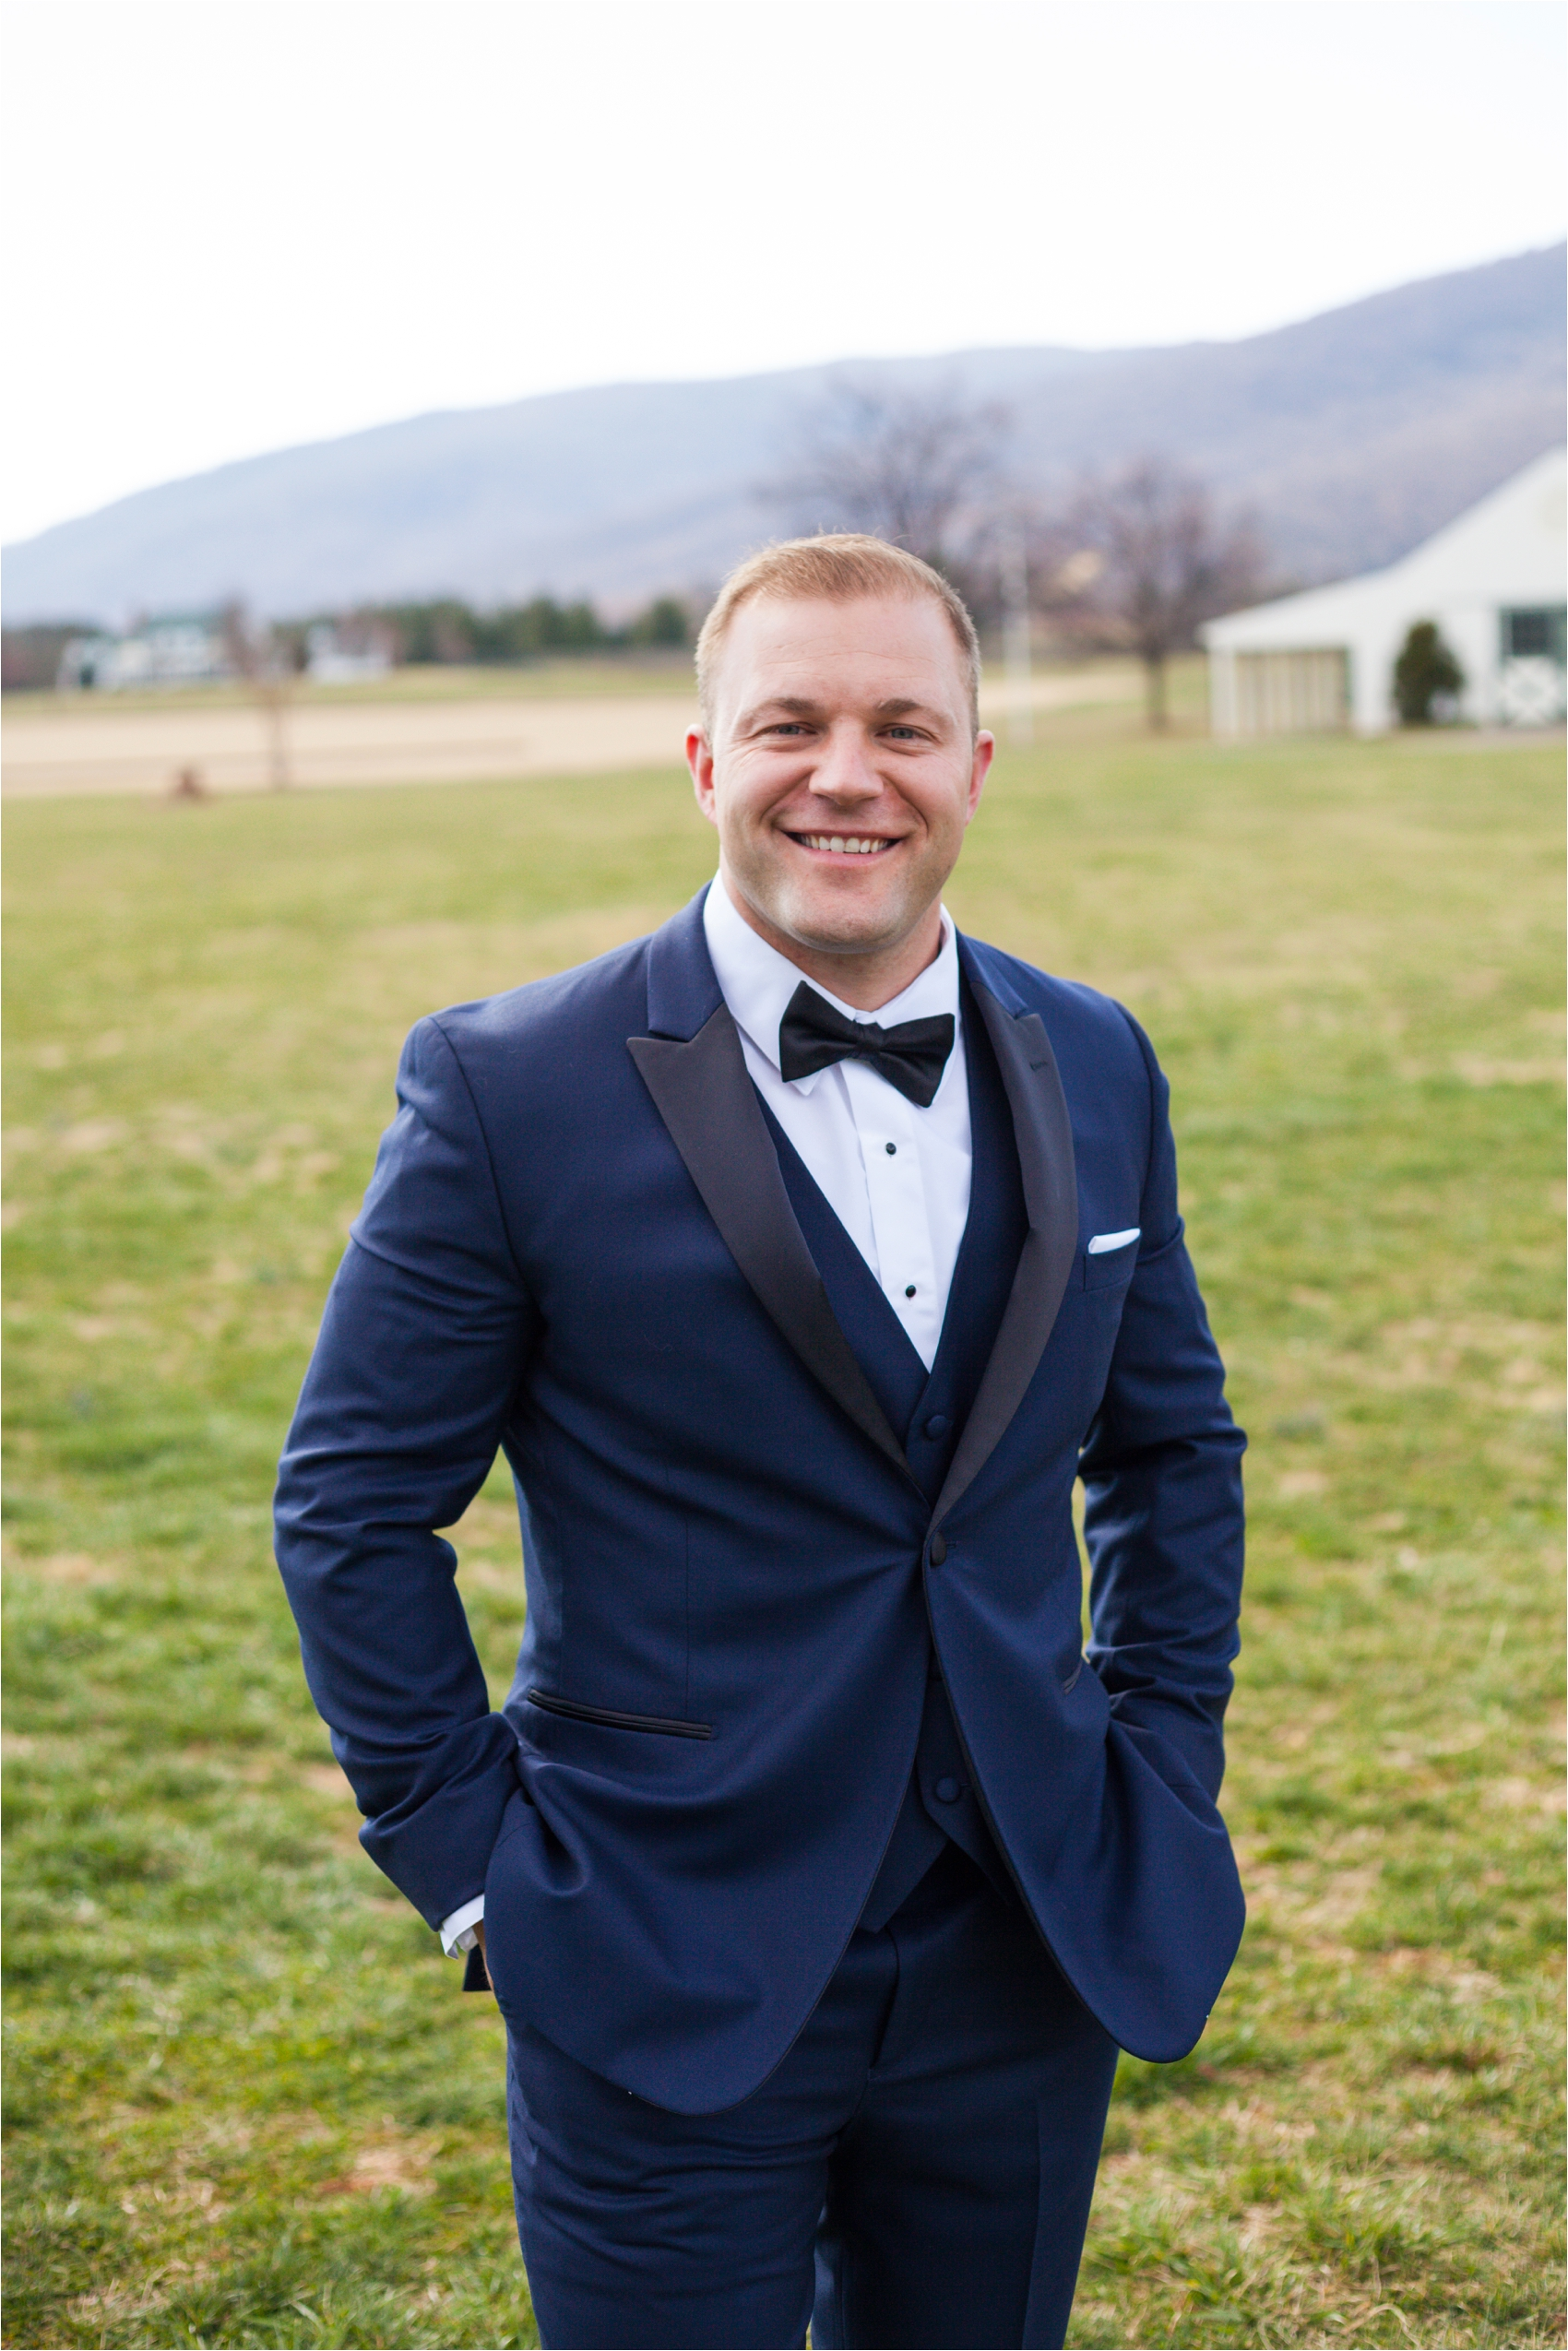 King-Family-Vineyard-Spring-Virginia-Wedding-1301.jpg